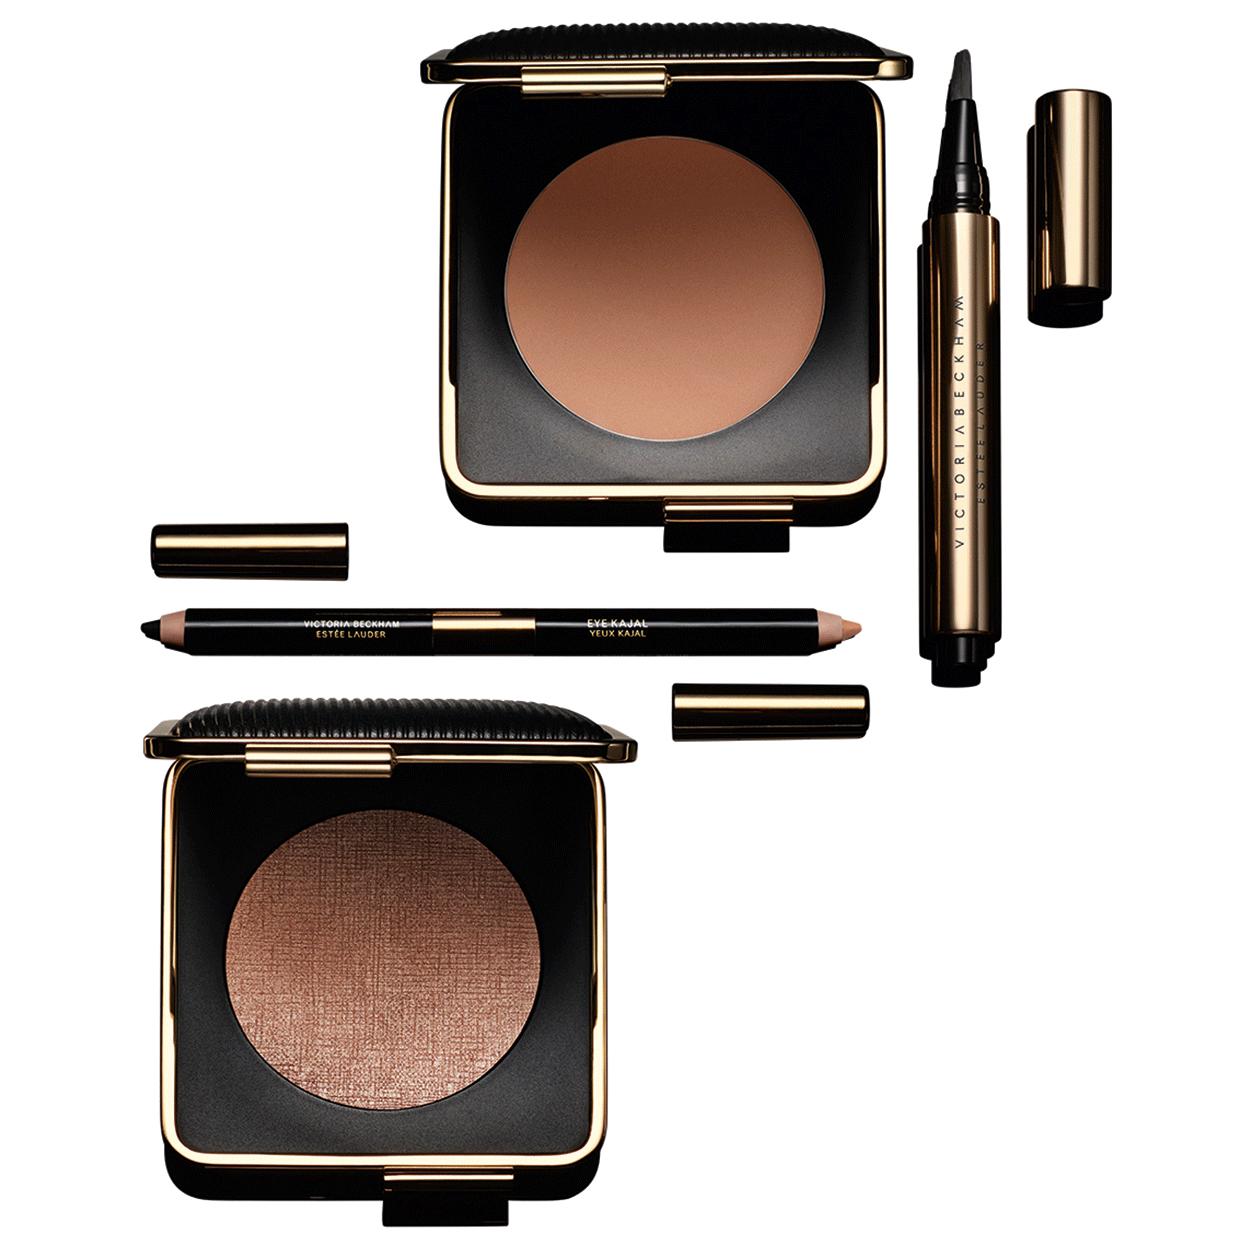 victoria-beckham-estee-lauder-makeup-collection-01-los-angeles